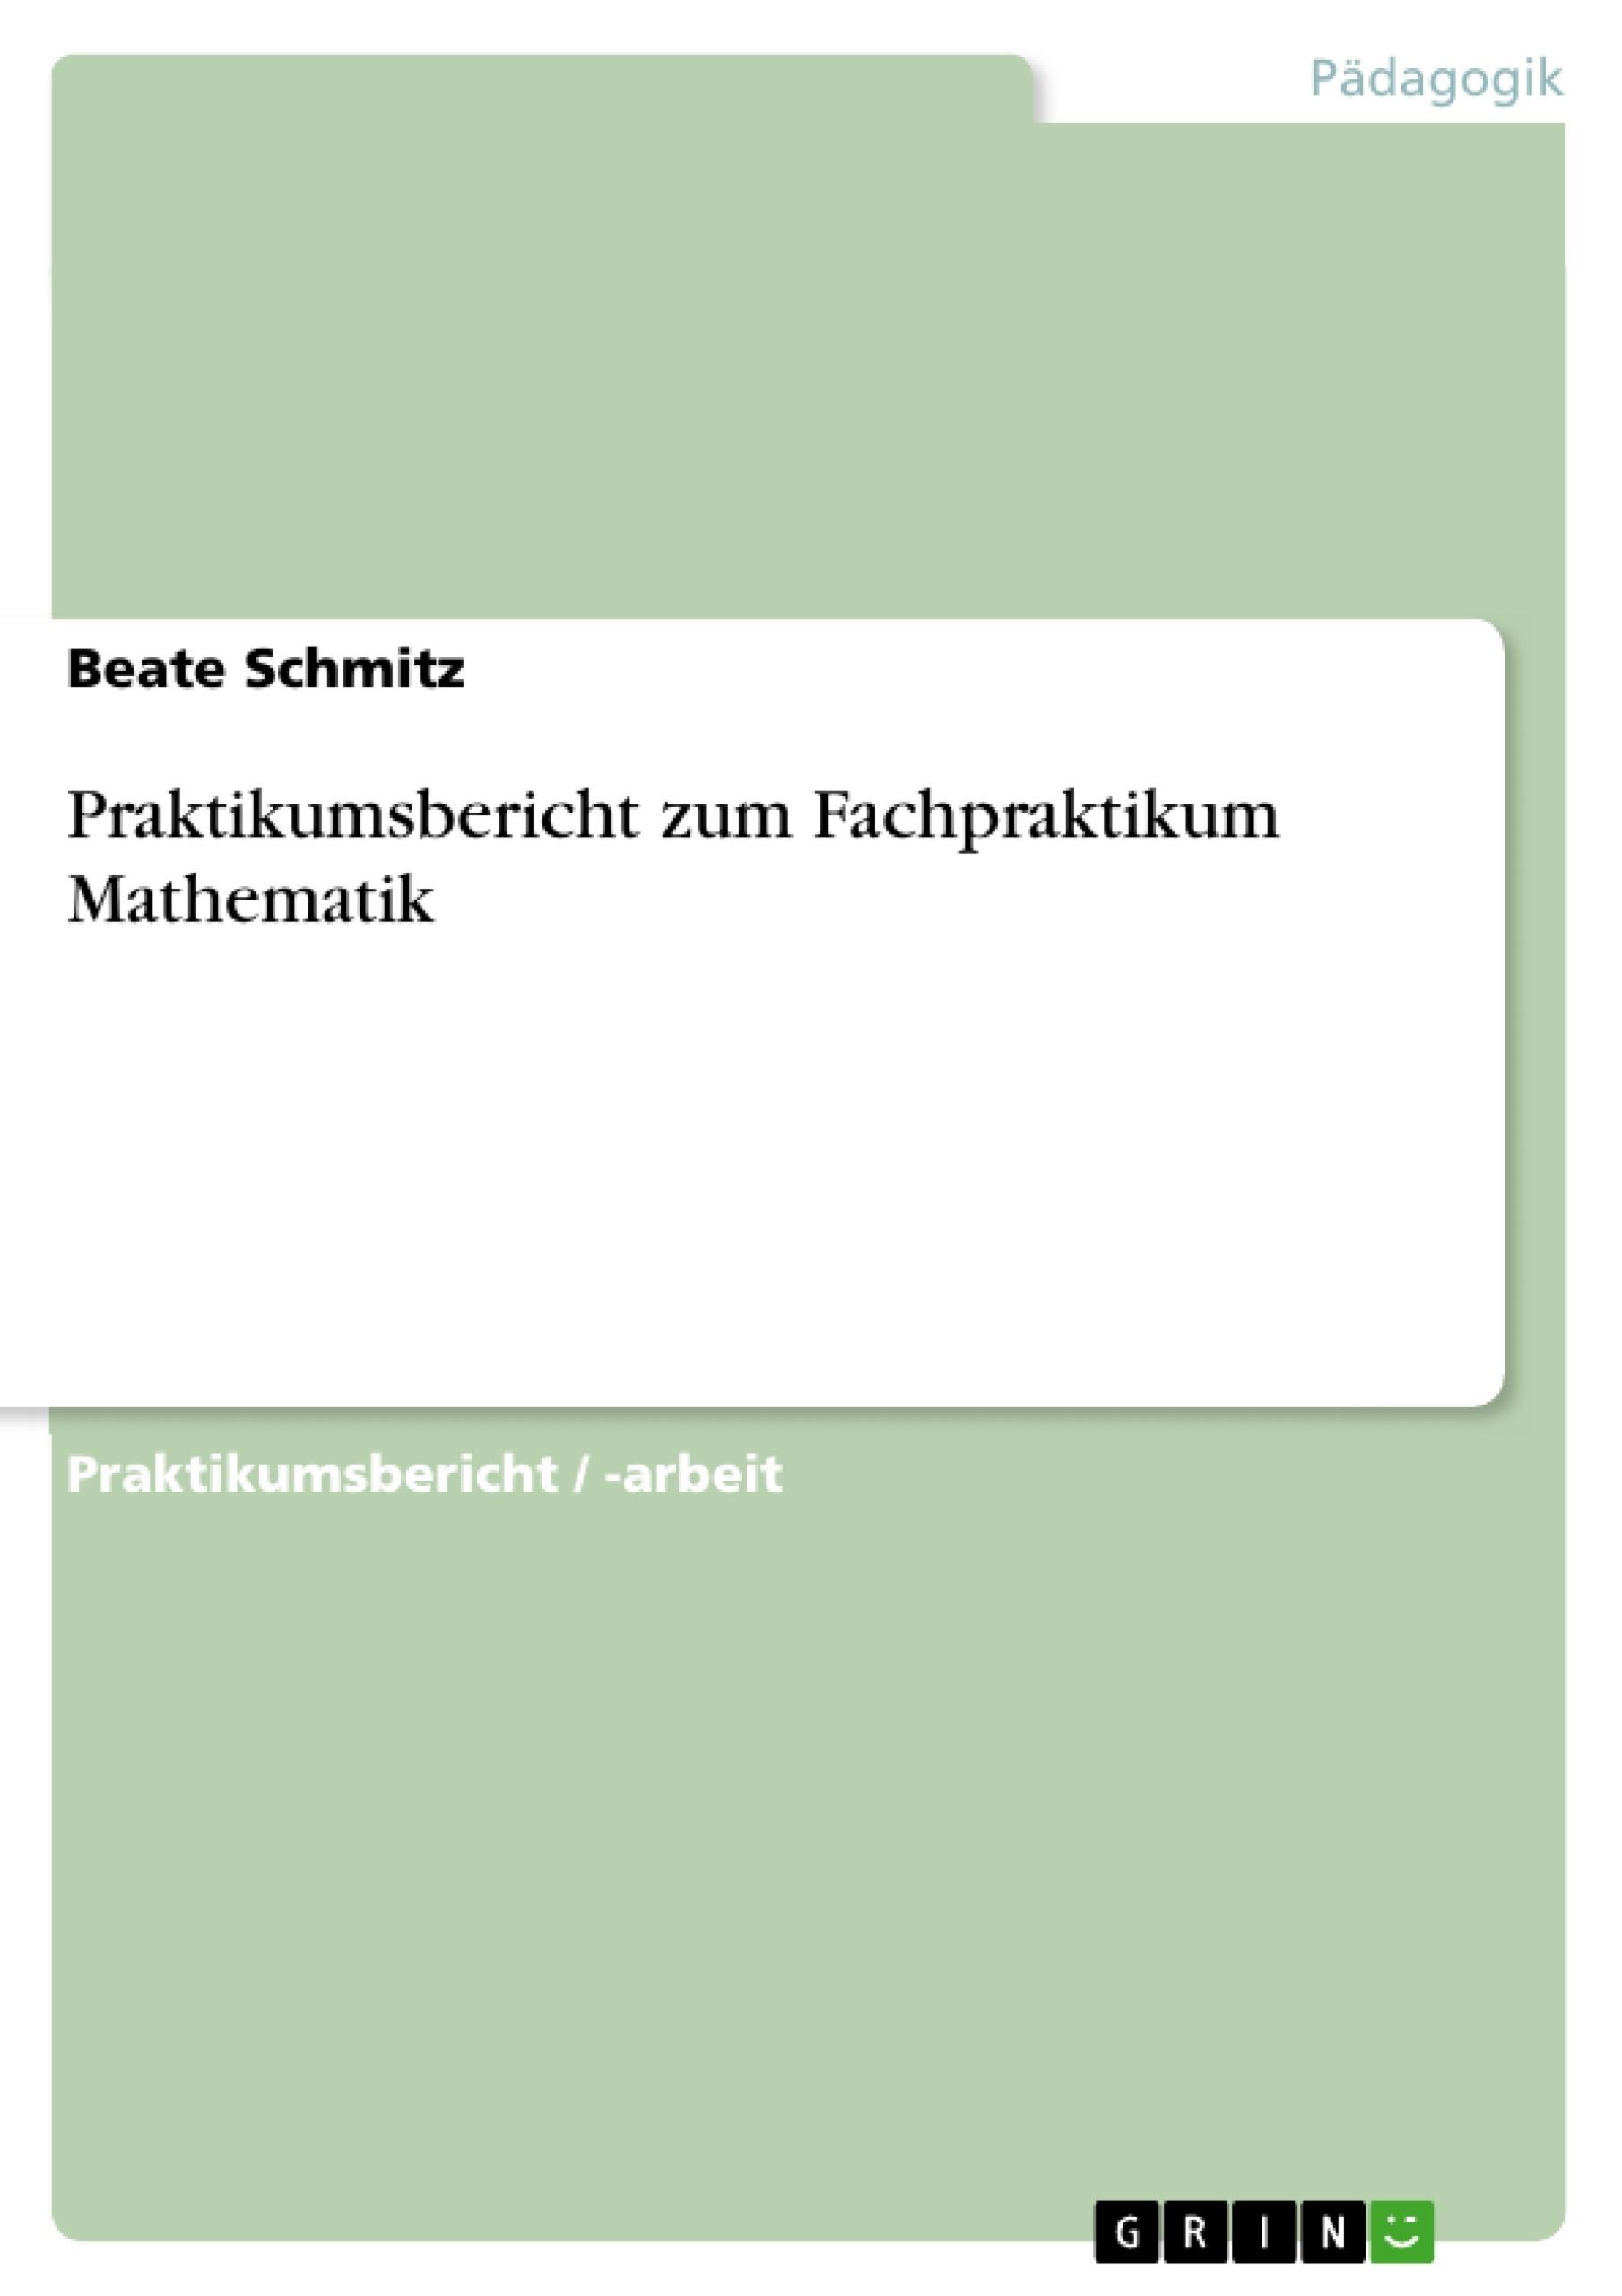 Praktikumsbericht zum Fachpraktikum Mathematik | Masterarbeit ...